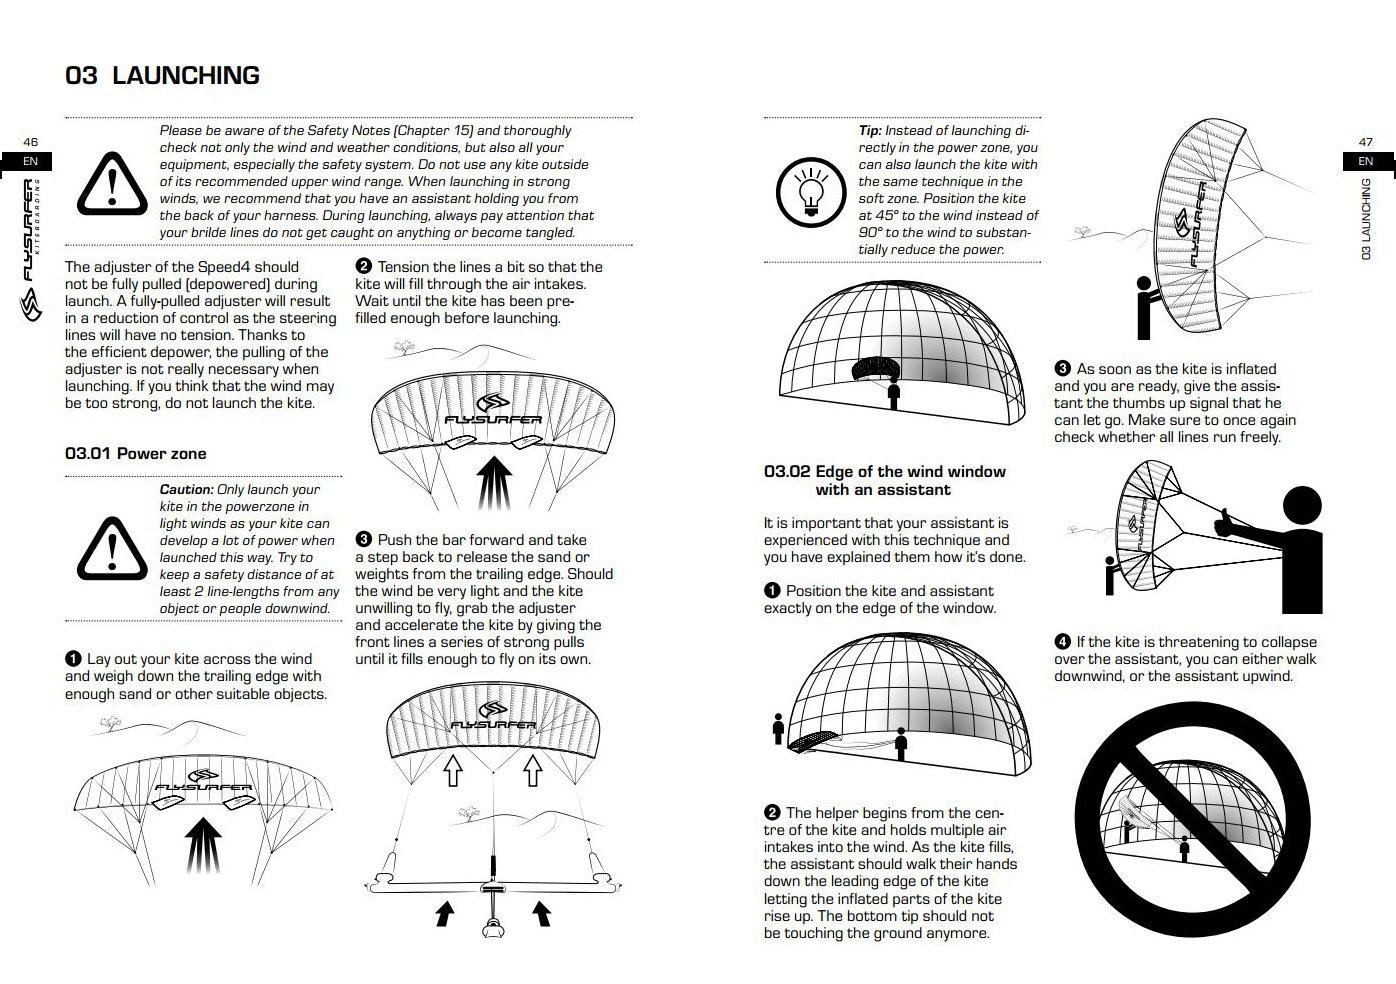 Flysurfer Speed 4 Speed4 Manual English Canada. Speed 4 8m